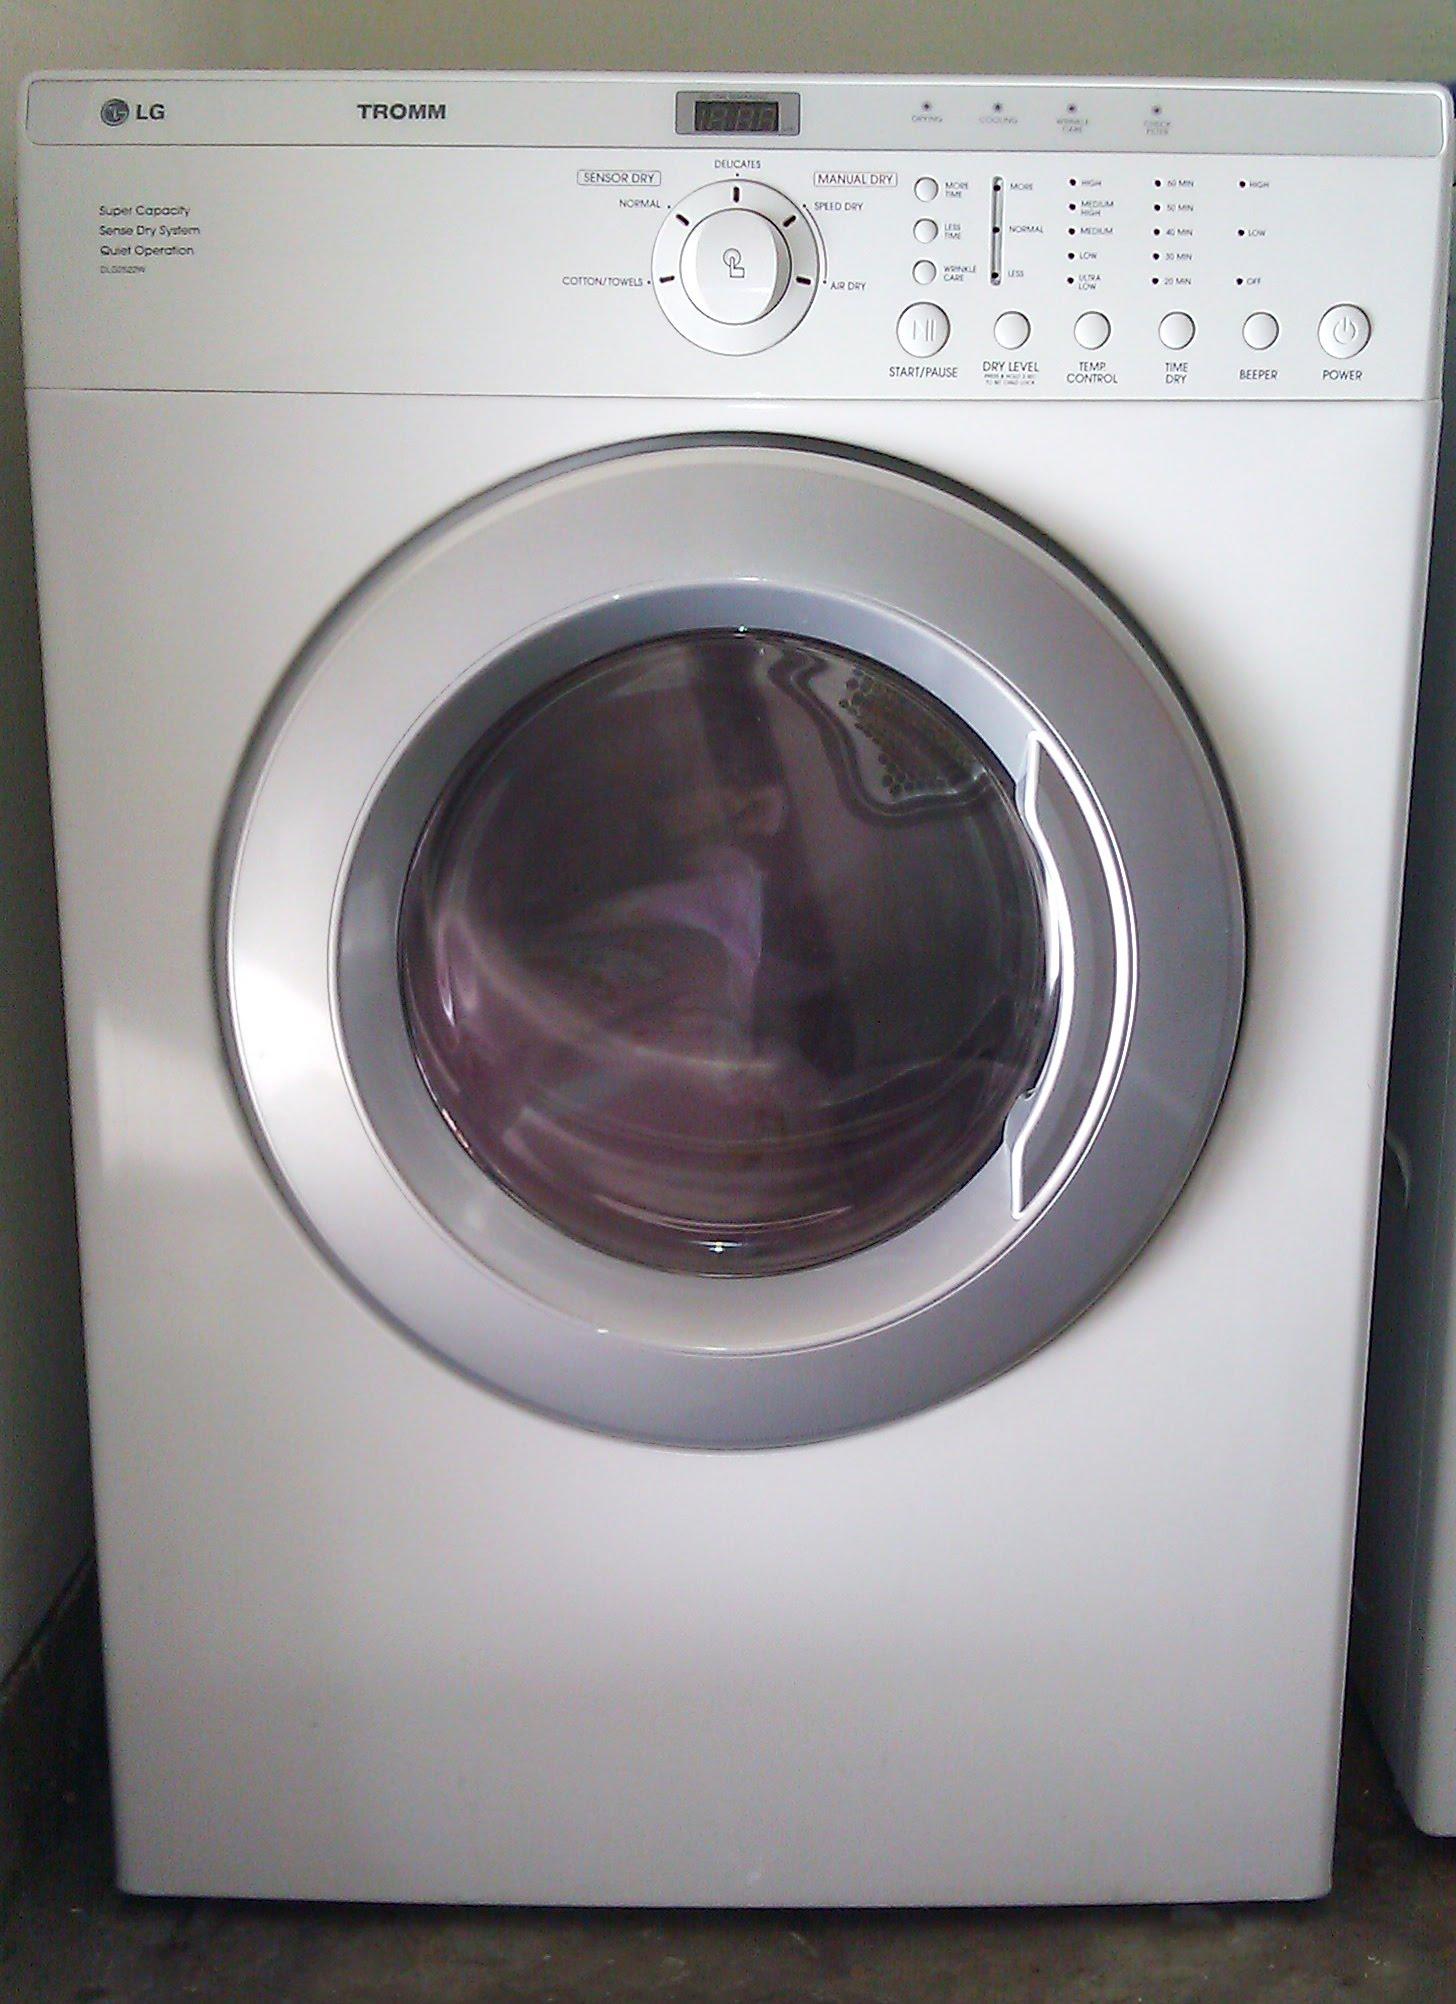 Comfortable Lg Tromm Gas Clos Dryer Doug Kramer Lg Tromm Dryer Error Codes Lg Tromm Dryer Filter houzz-02 Lg Tromm Dryer